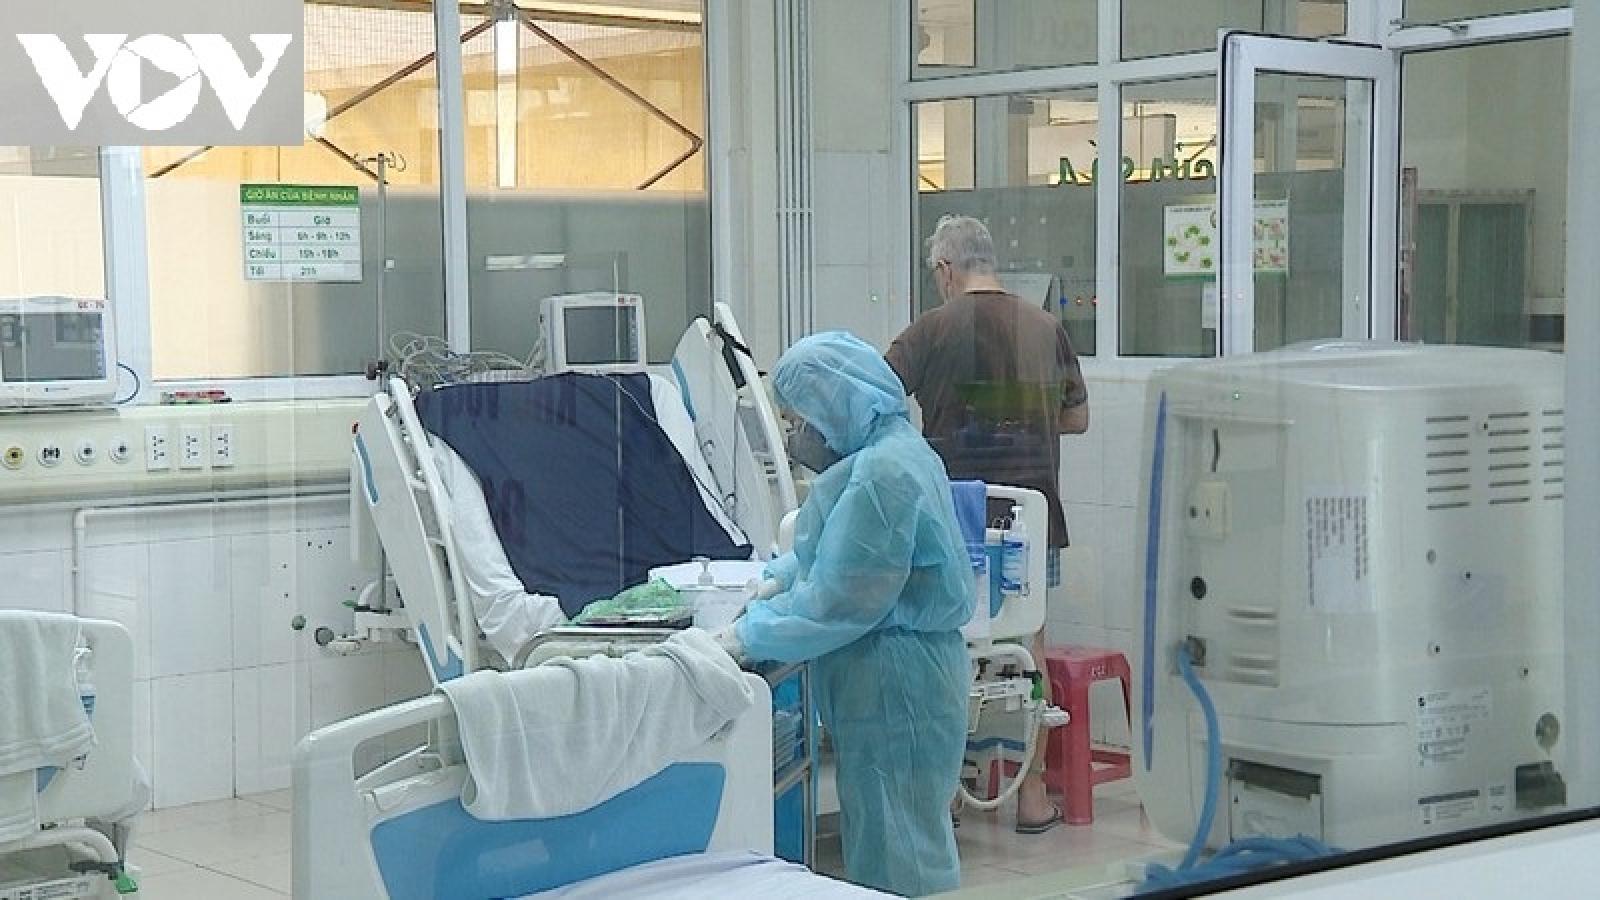 Da Nang: COVID-19 patient turns critical, relies on ECMO